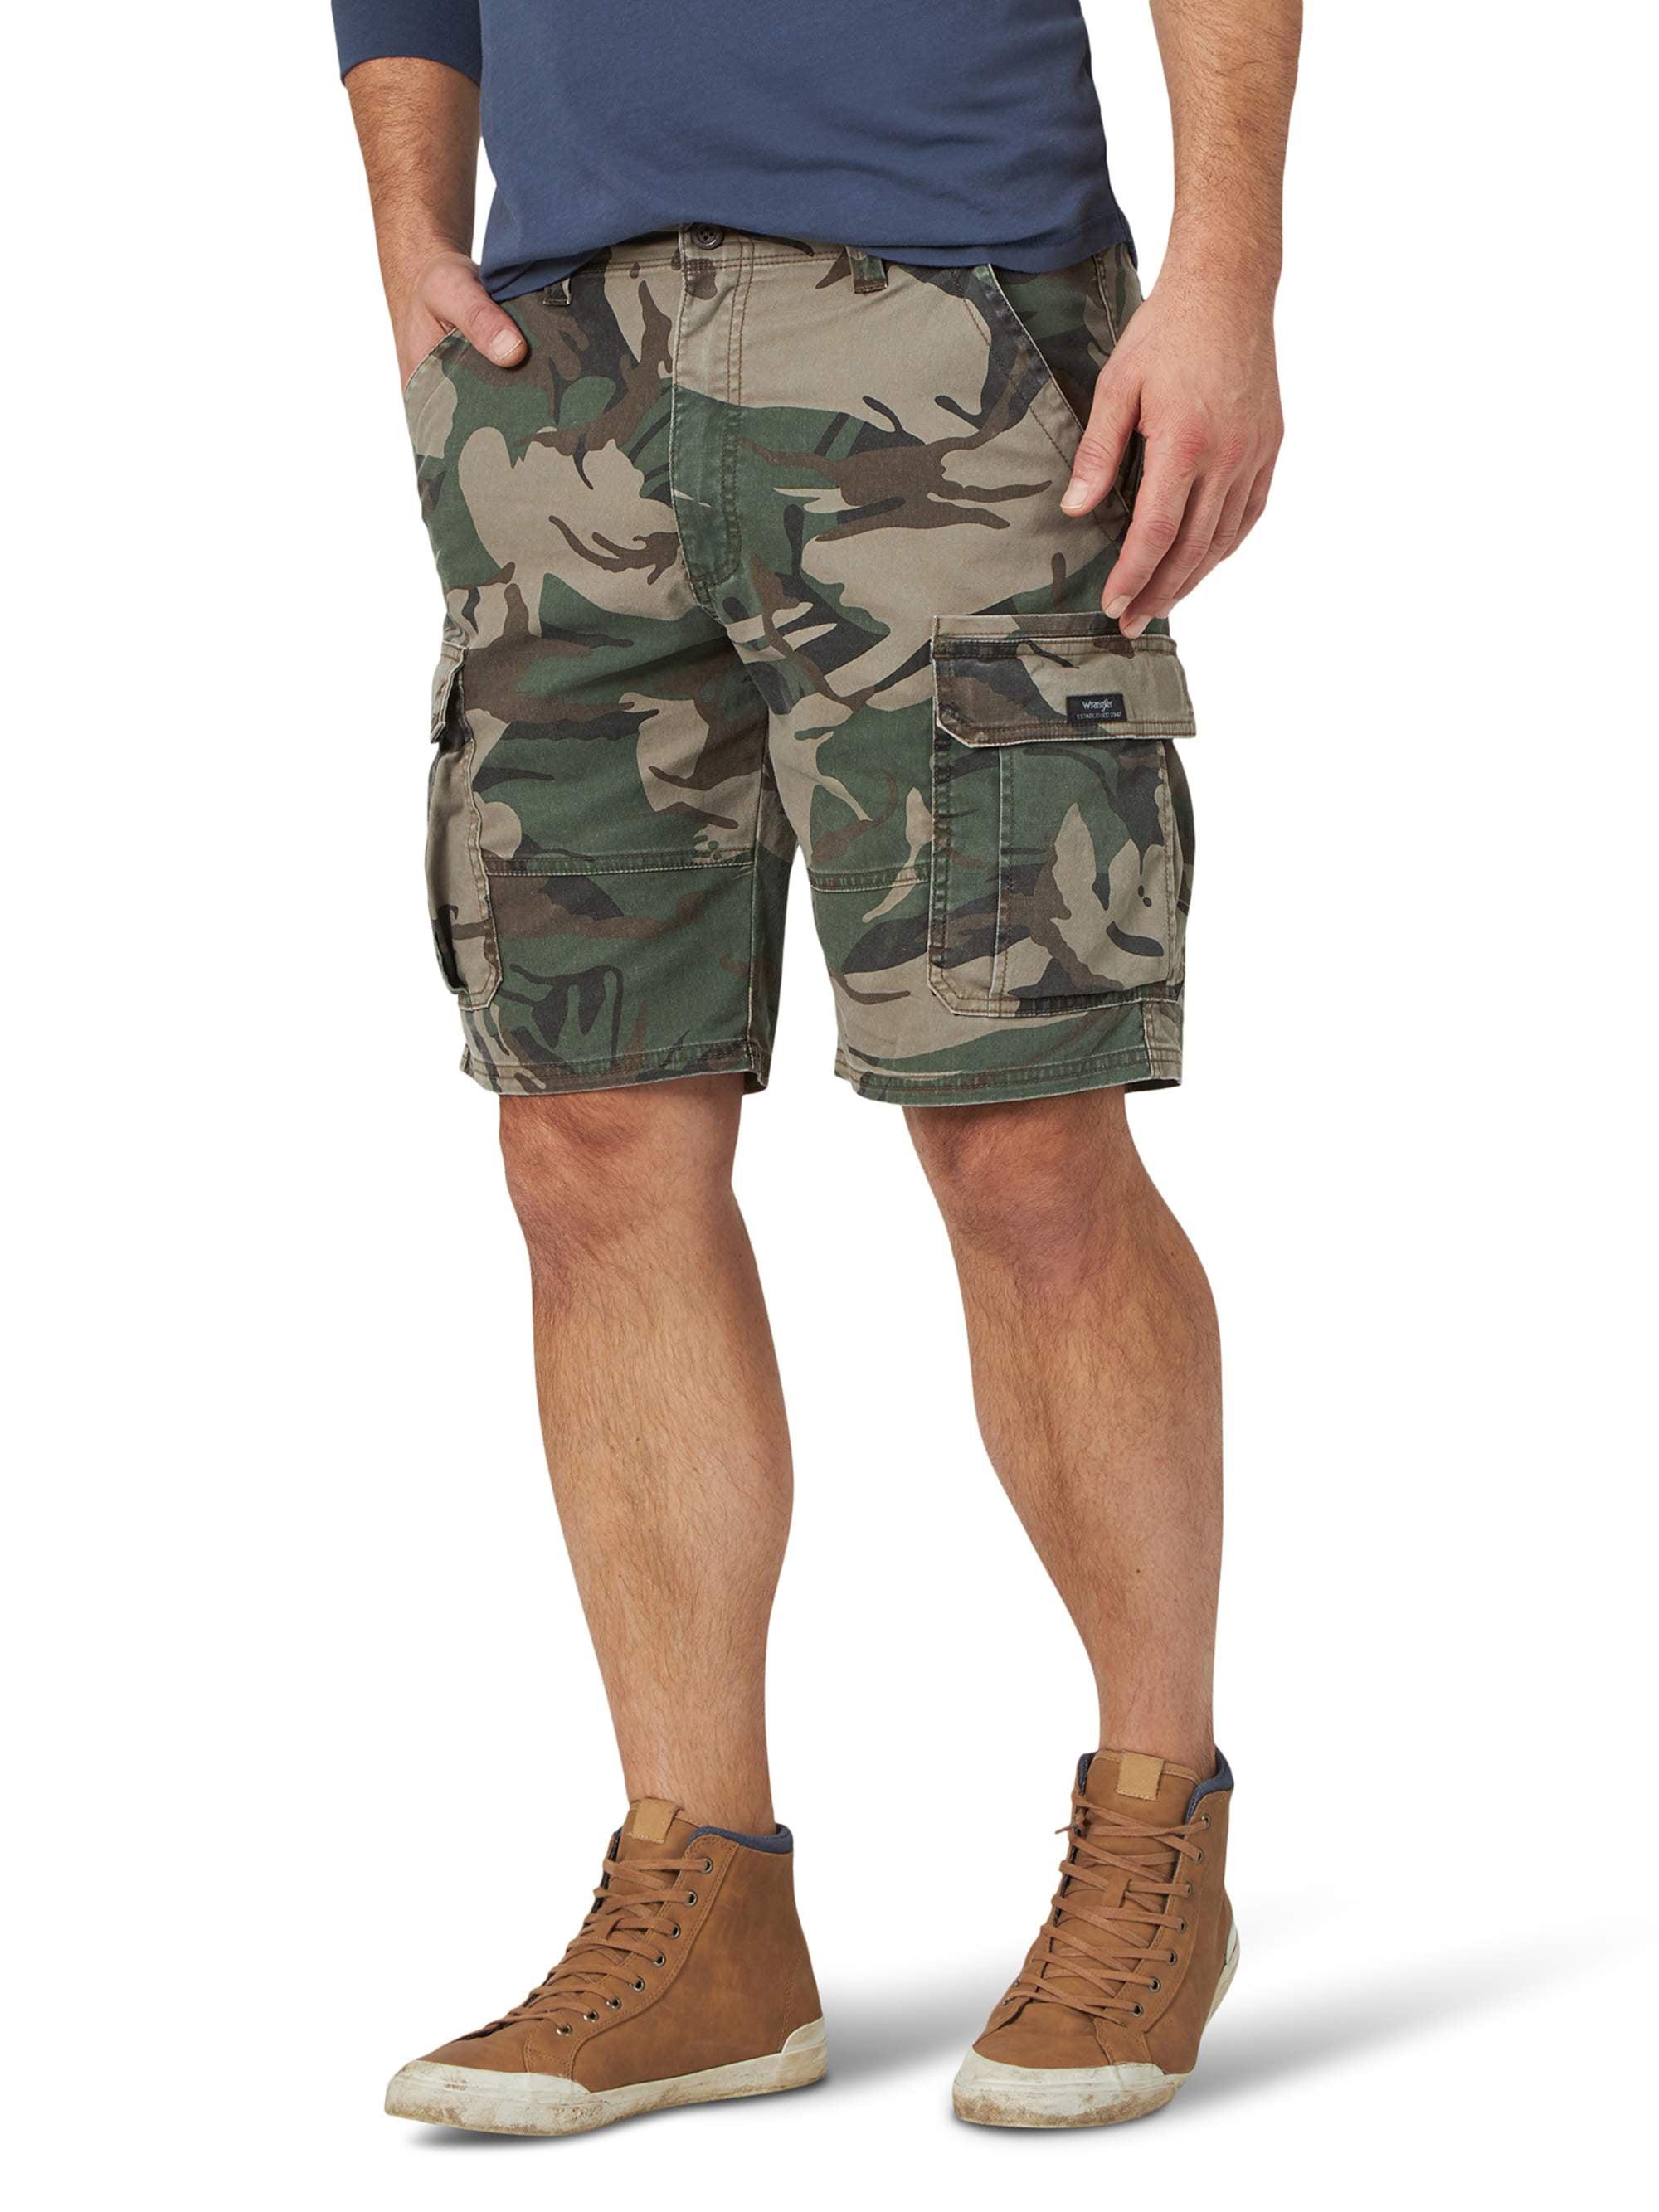 Botany Bay Traders Mens Original Stretch Walk Shorts size 97 Colour Light Denim